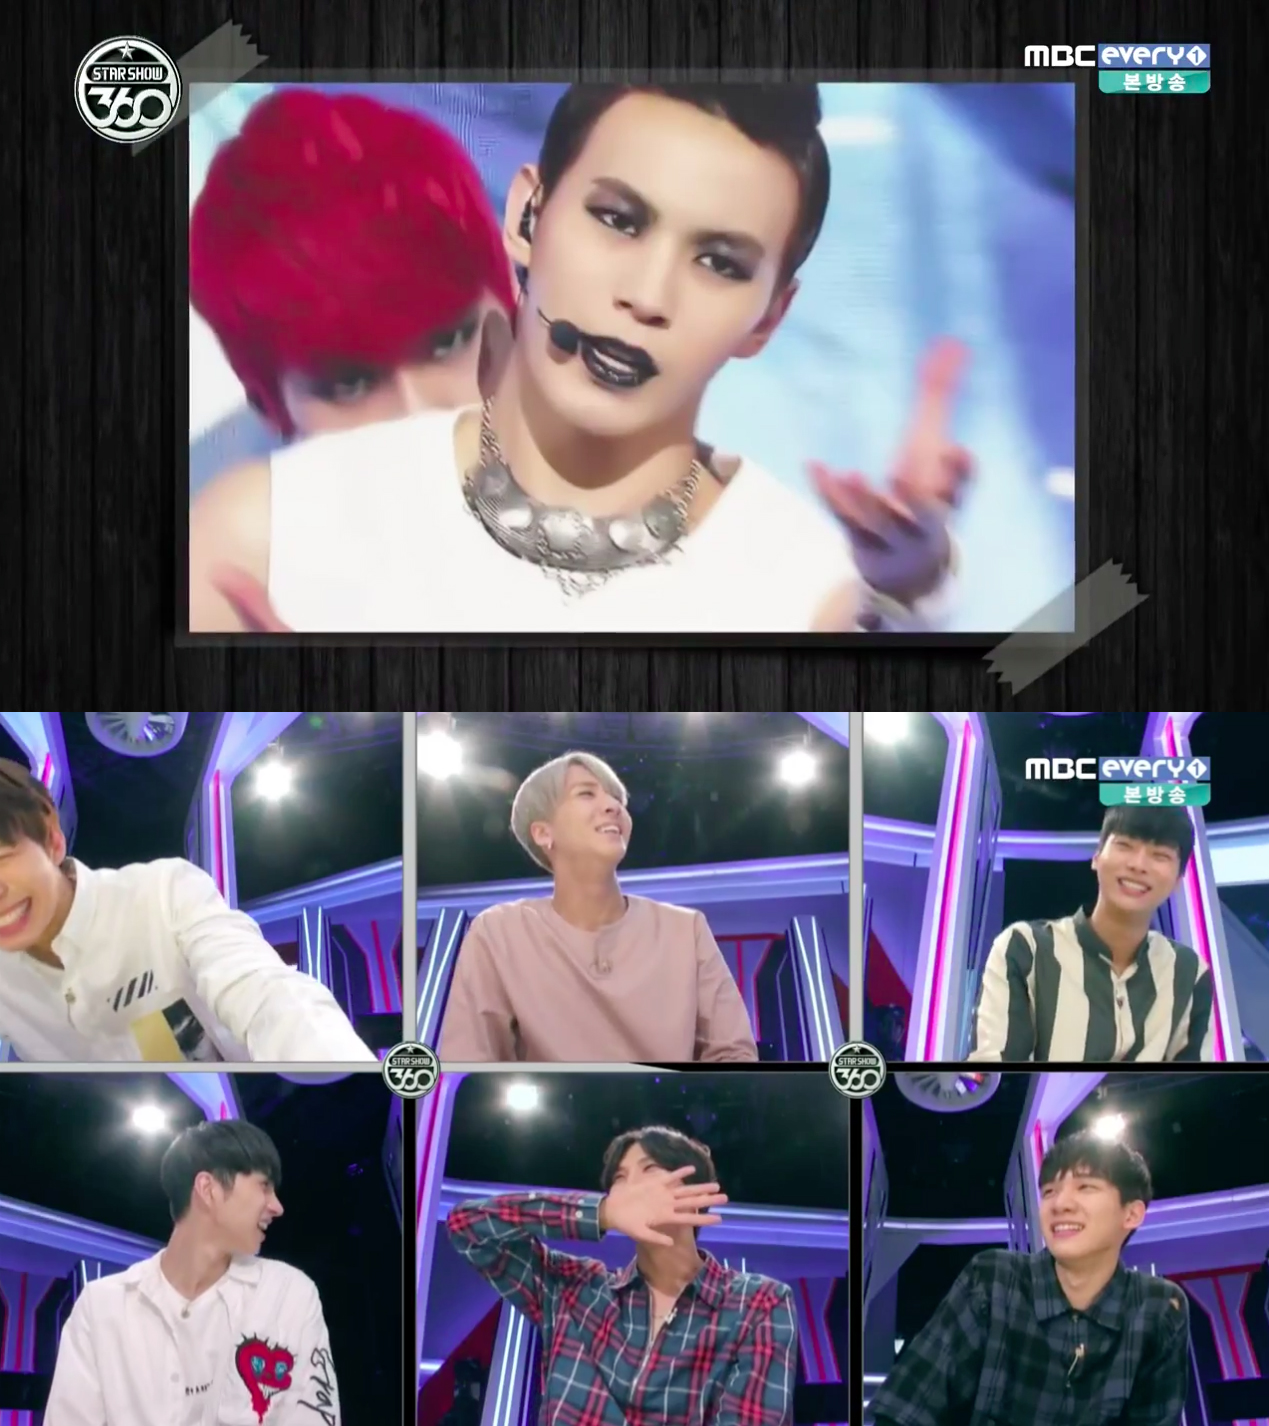 vixx-star-show-3